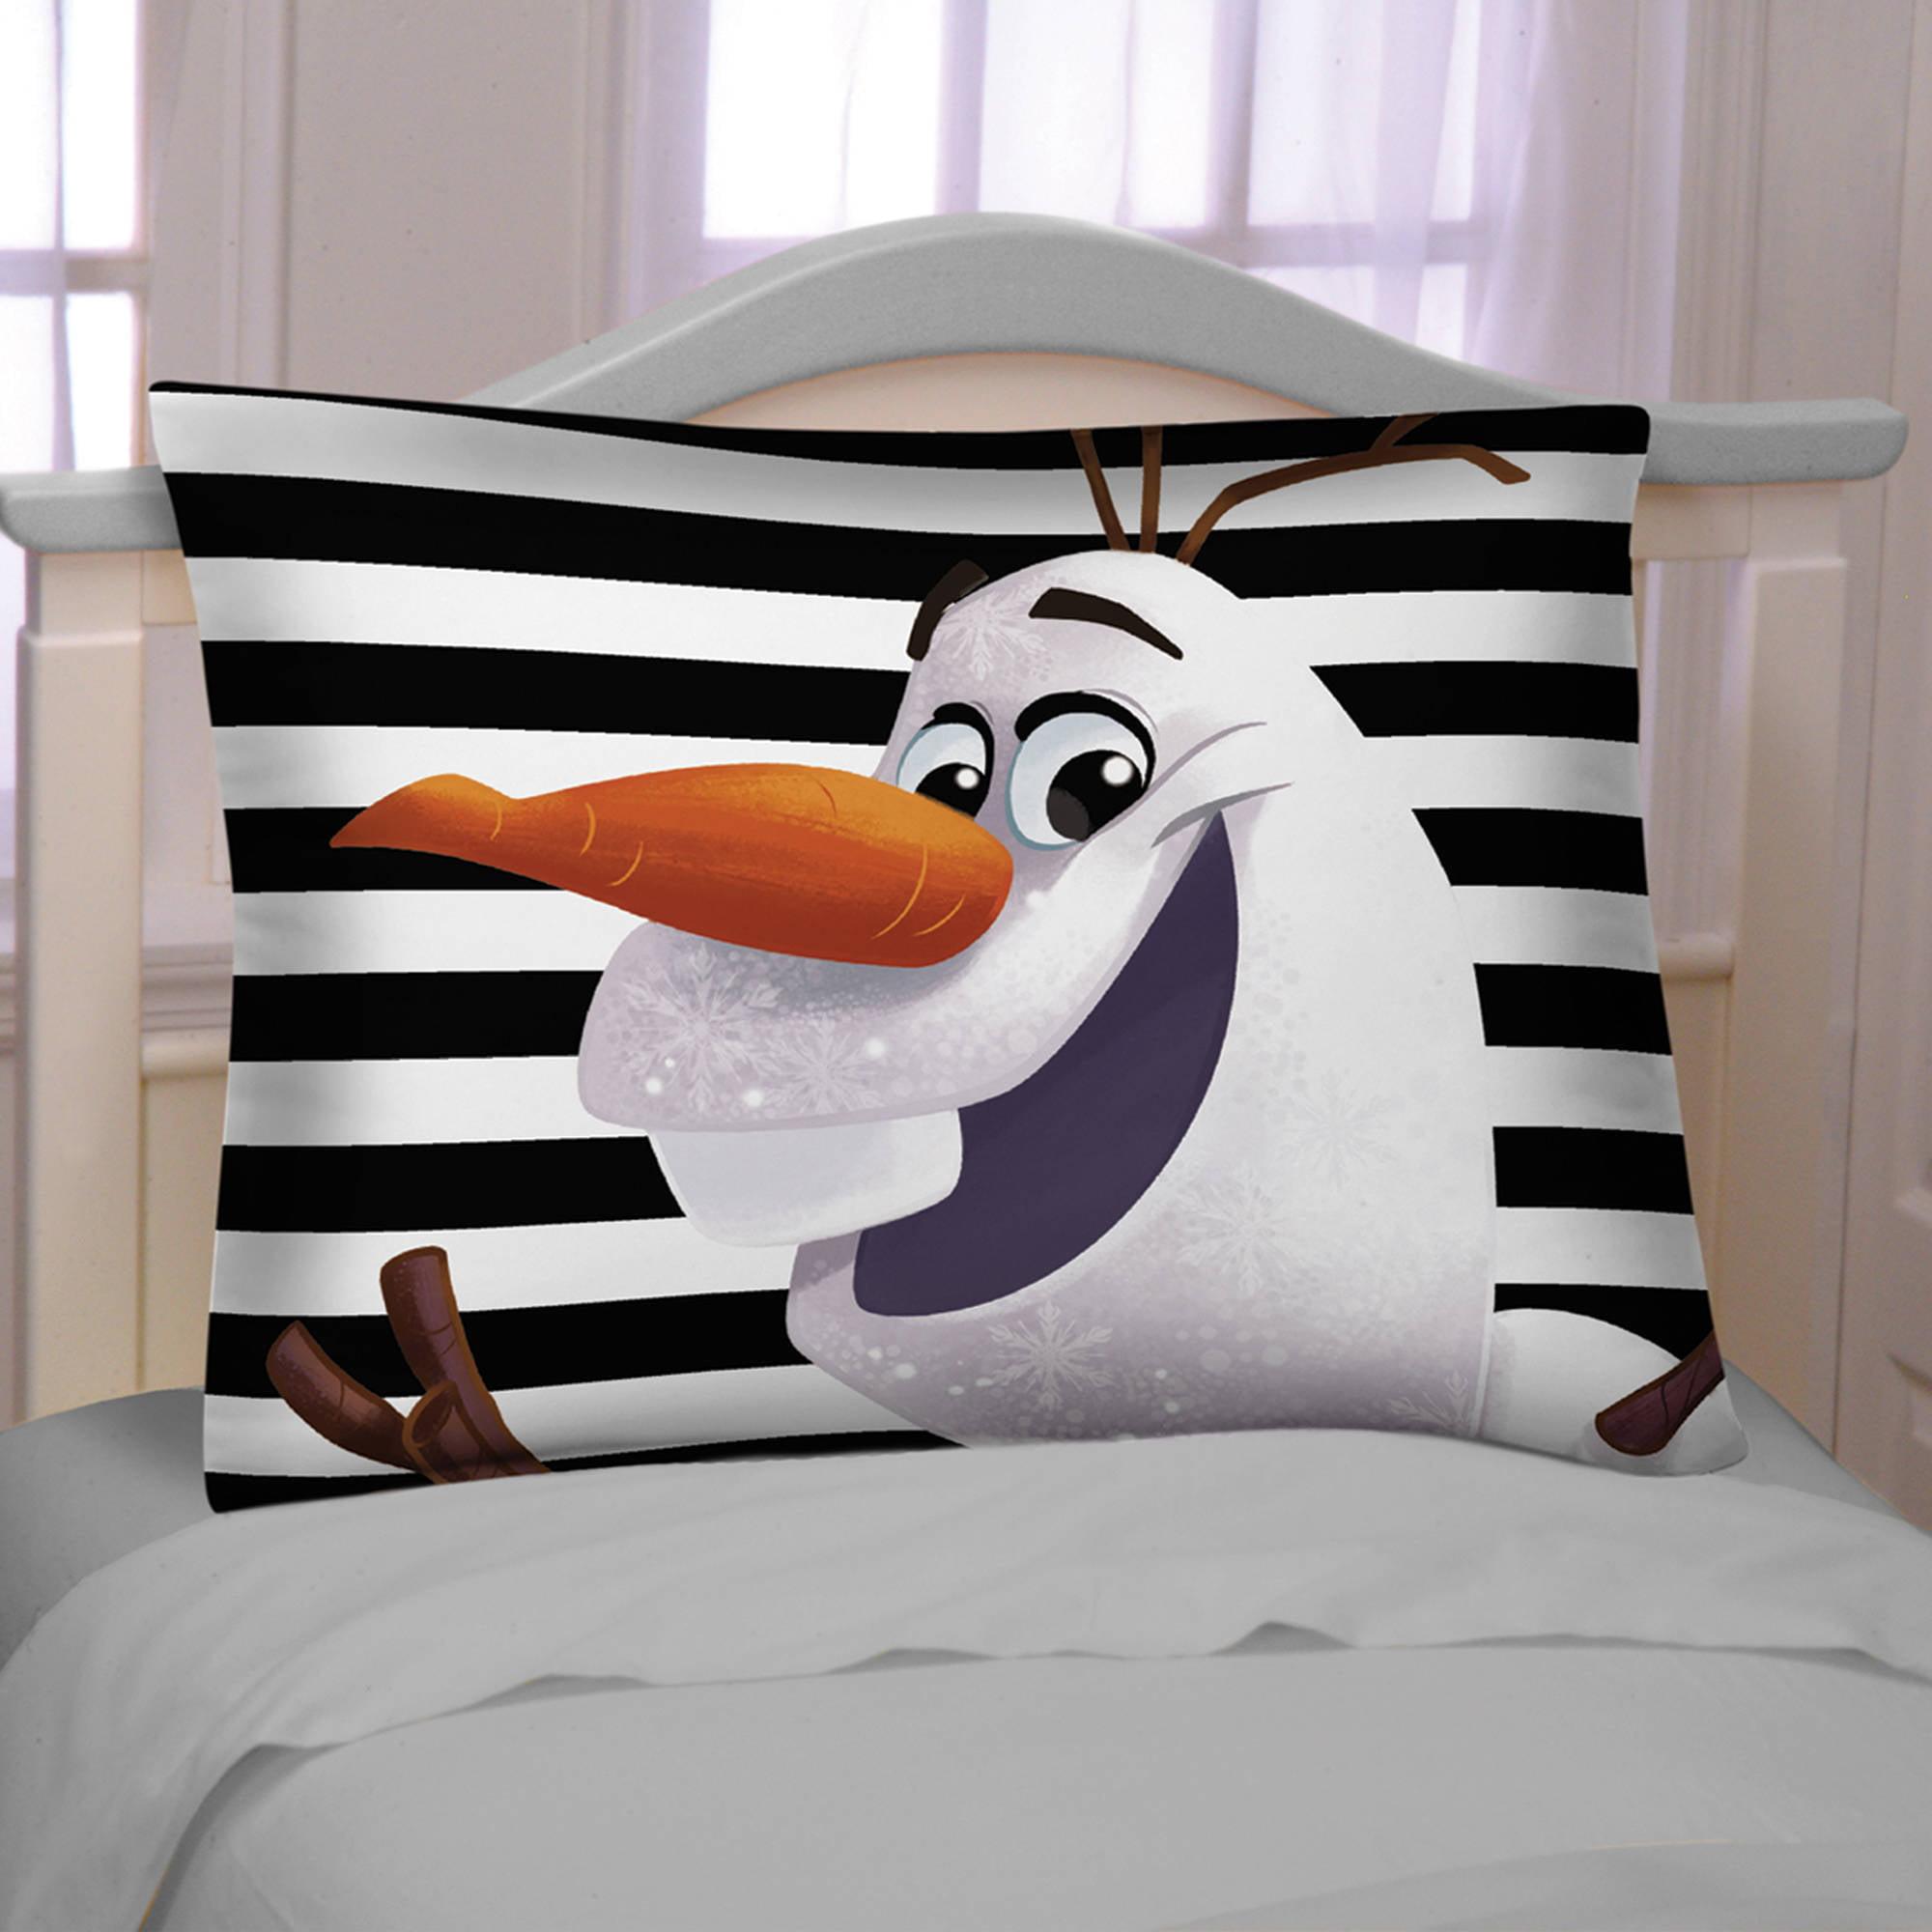 Disney's Frozen Olaf Plaid Reversible Pillowcase